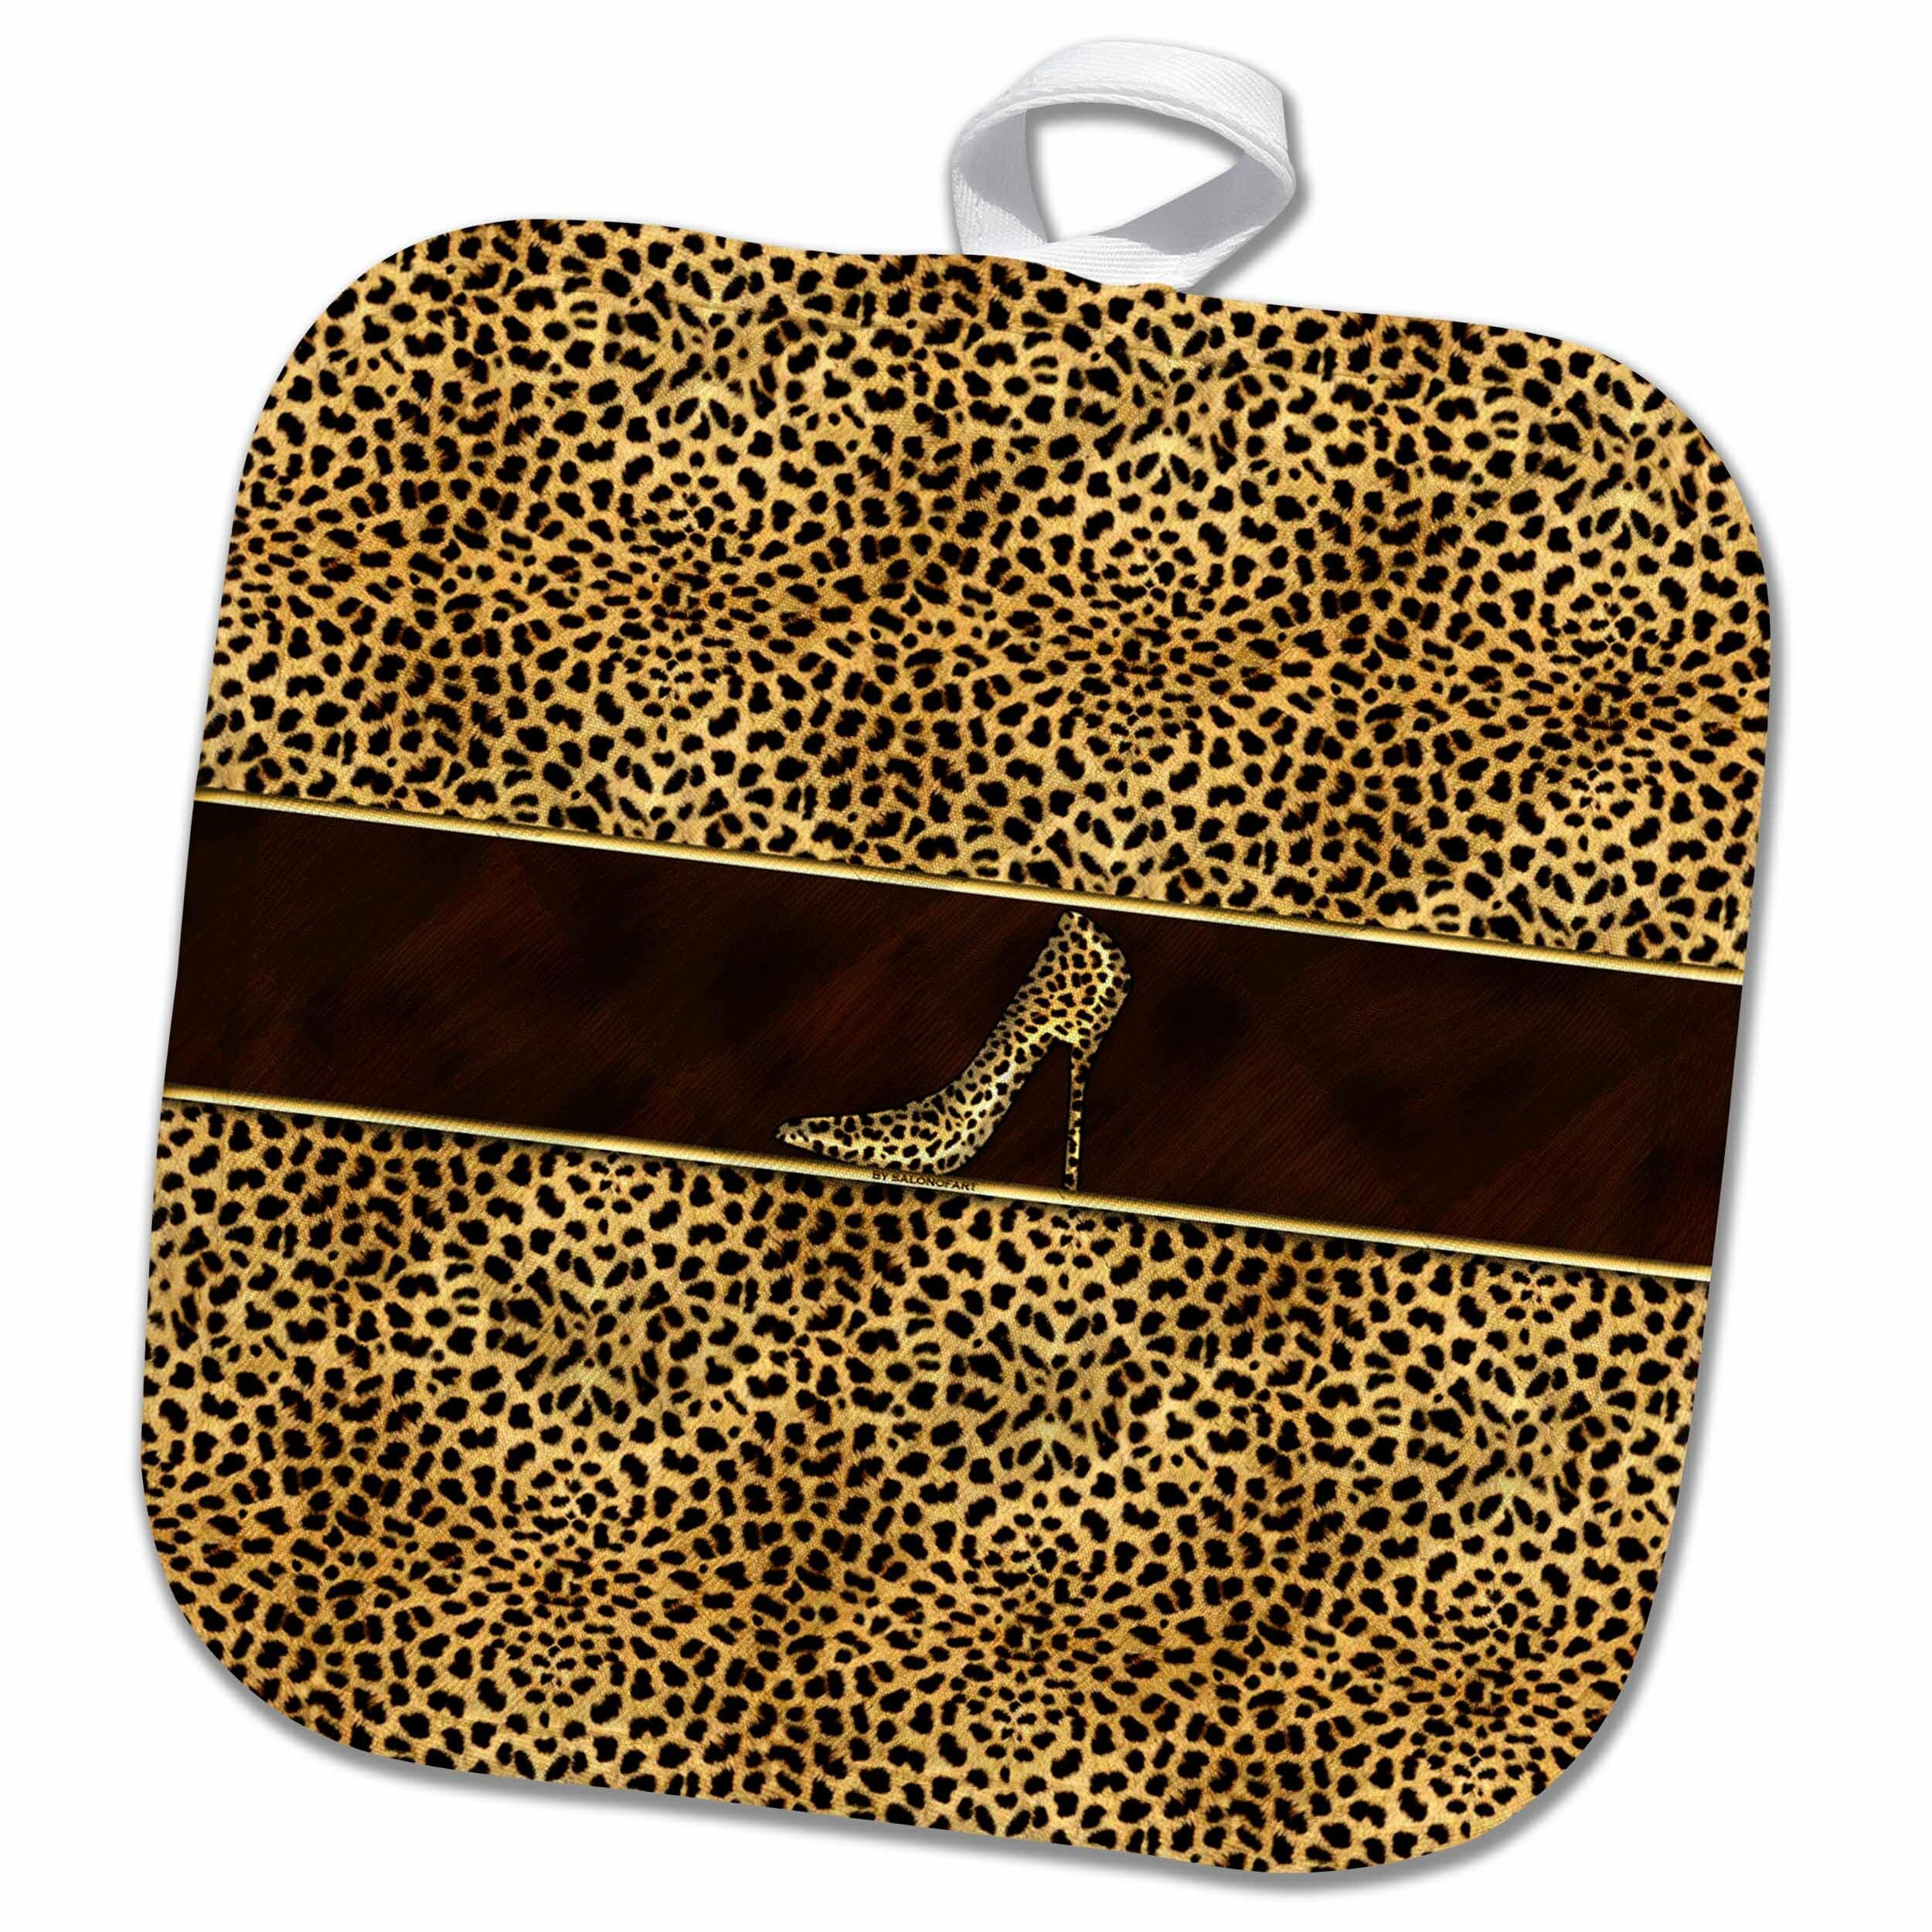 3drose Cheetah Print And Stiletto Heel Potholder Wayfair